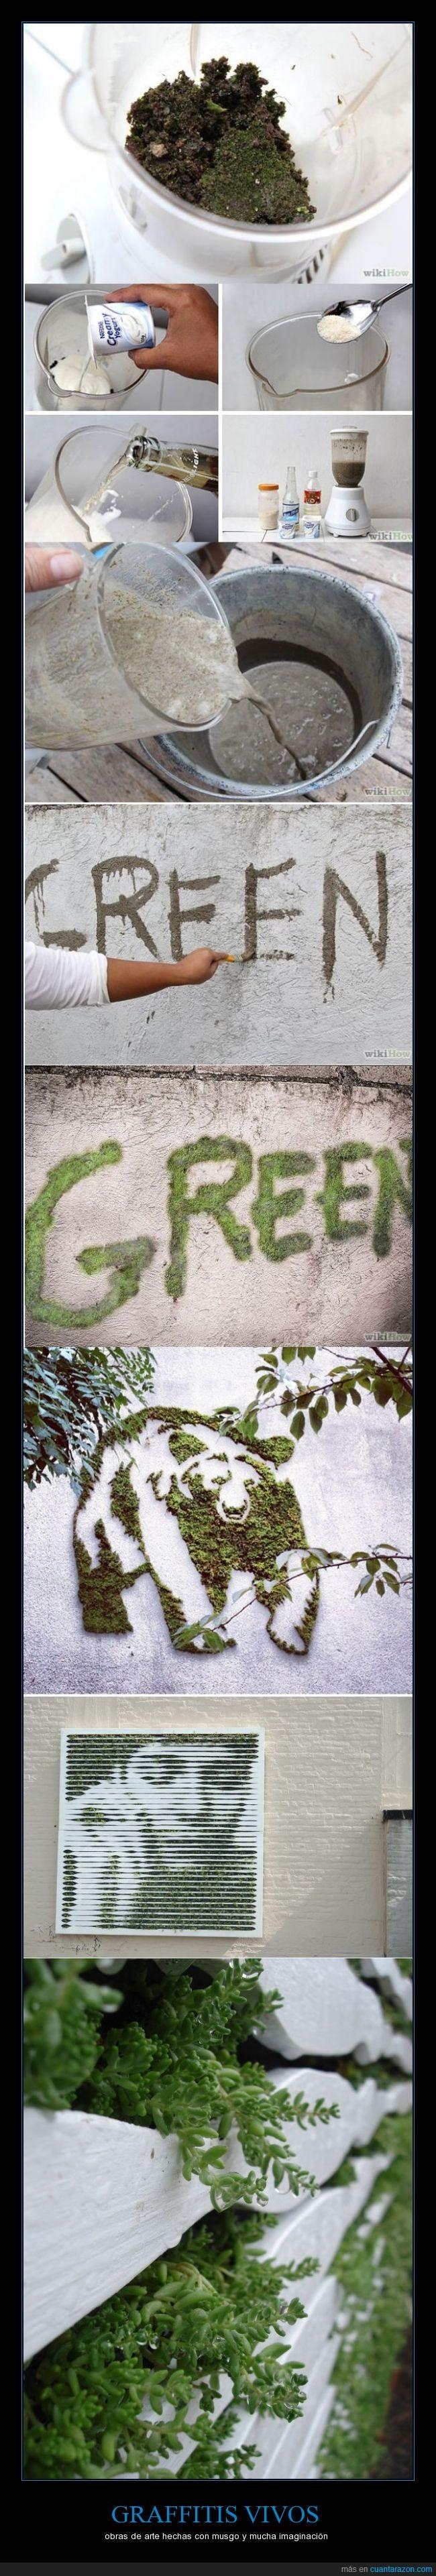 arte,graffiti,musgo,naturaleza,original,oso,planta,retrato,vivo